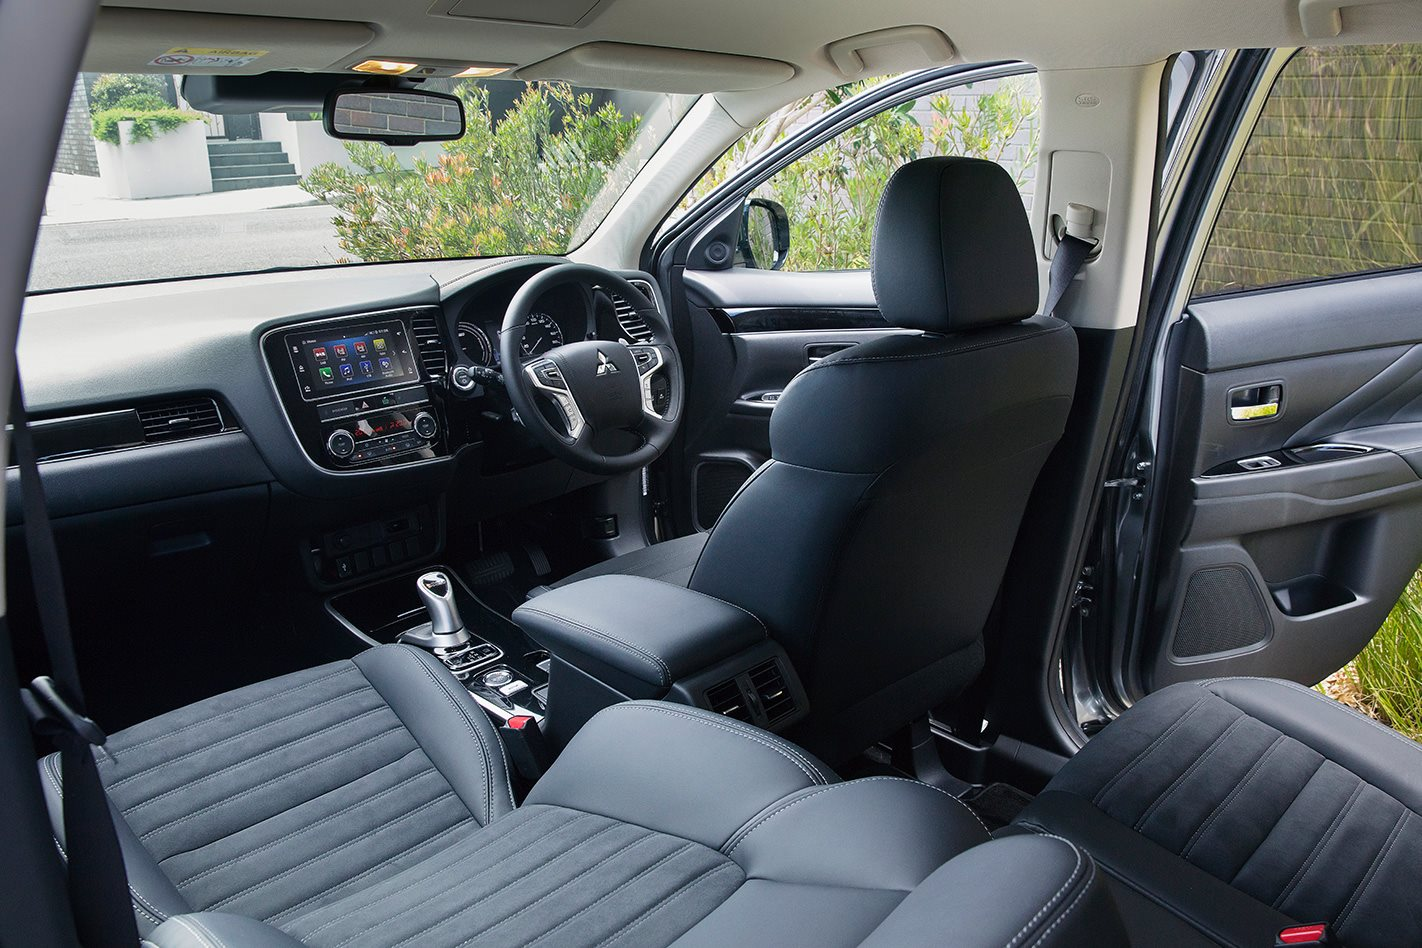 2019 Mitsubishi Outlander PHEV review: Plug-in hybrid Megatest